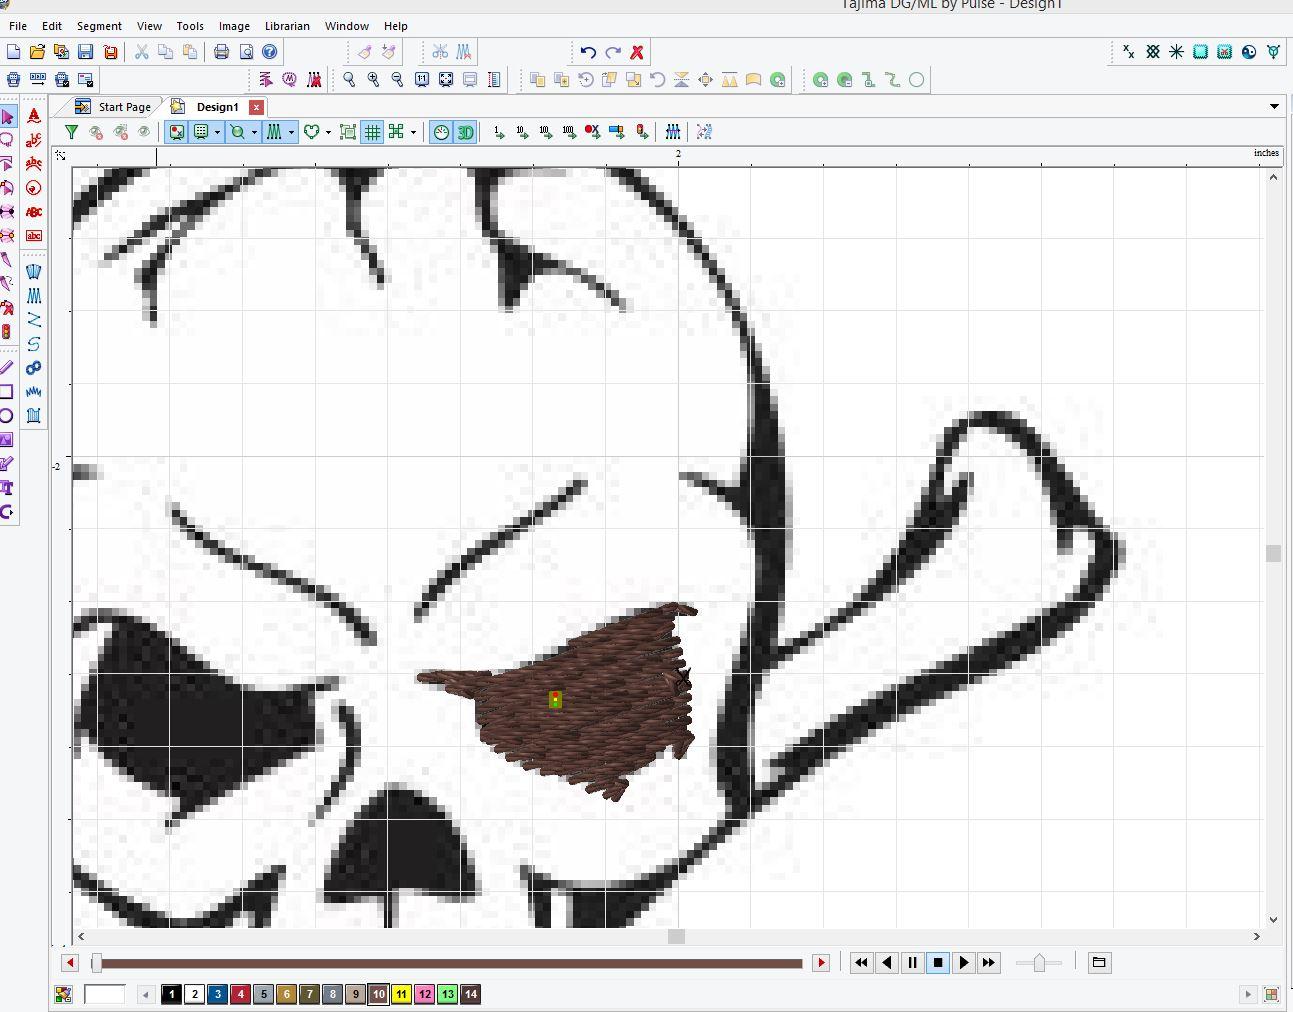 custom team patch in stitches.jpg